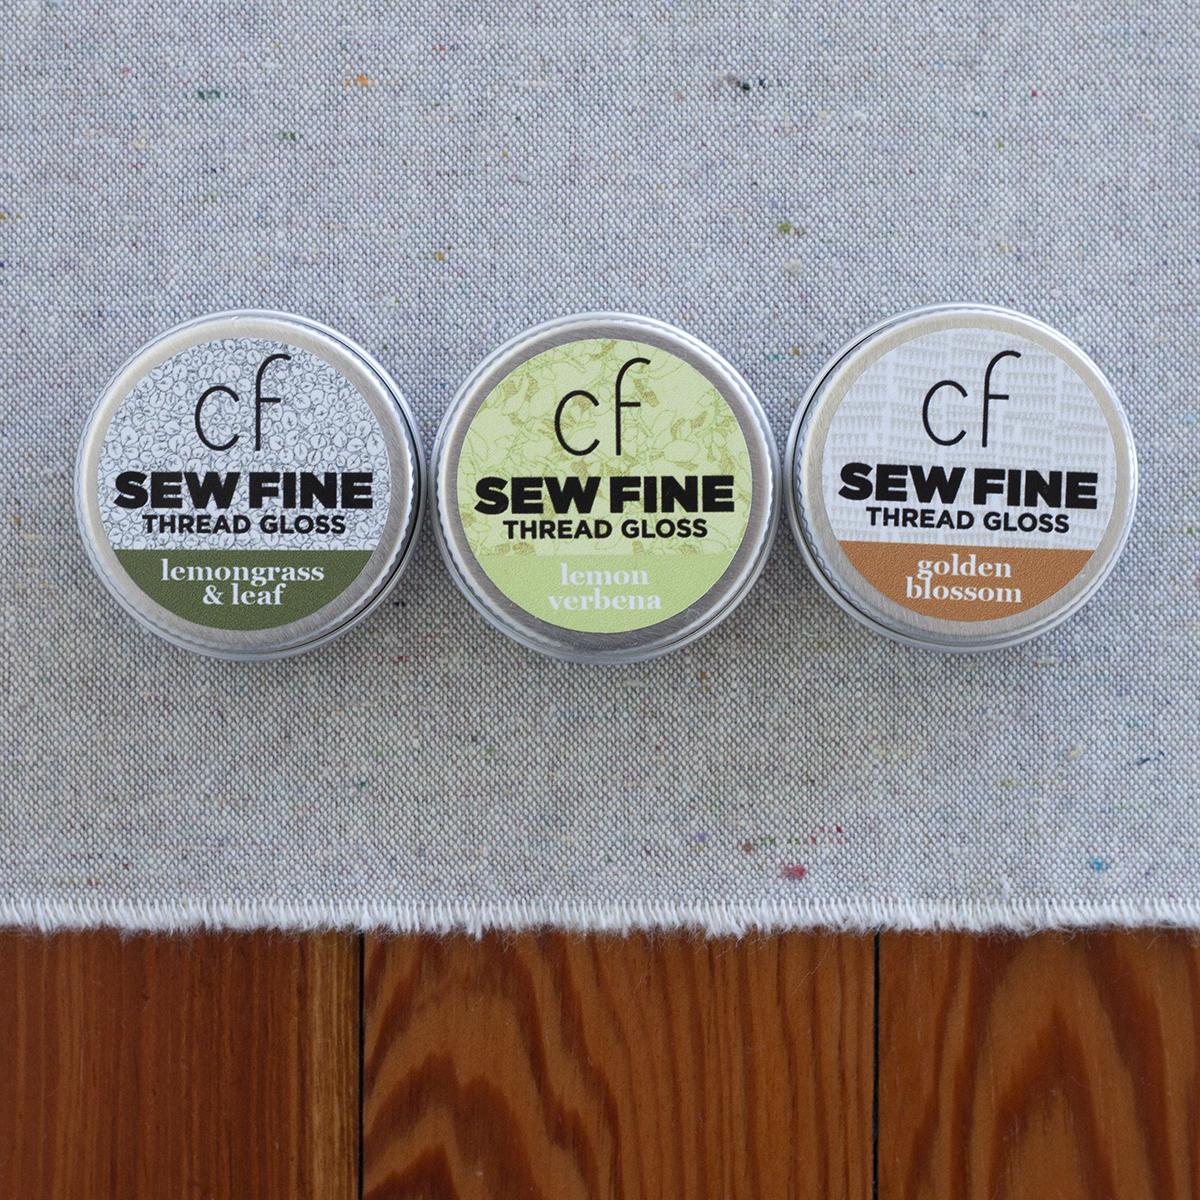 Sew Fine Thread Gloss CF collaboration